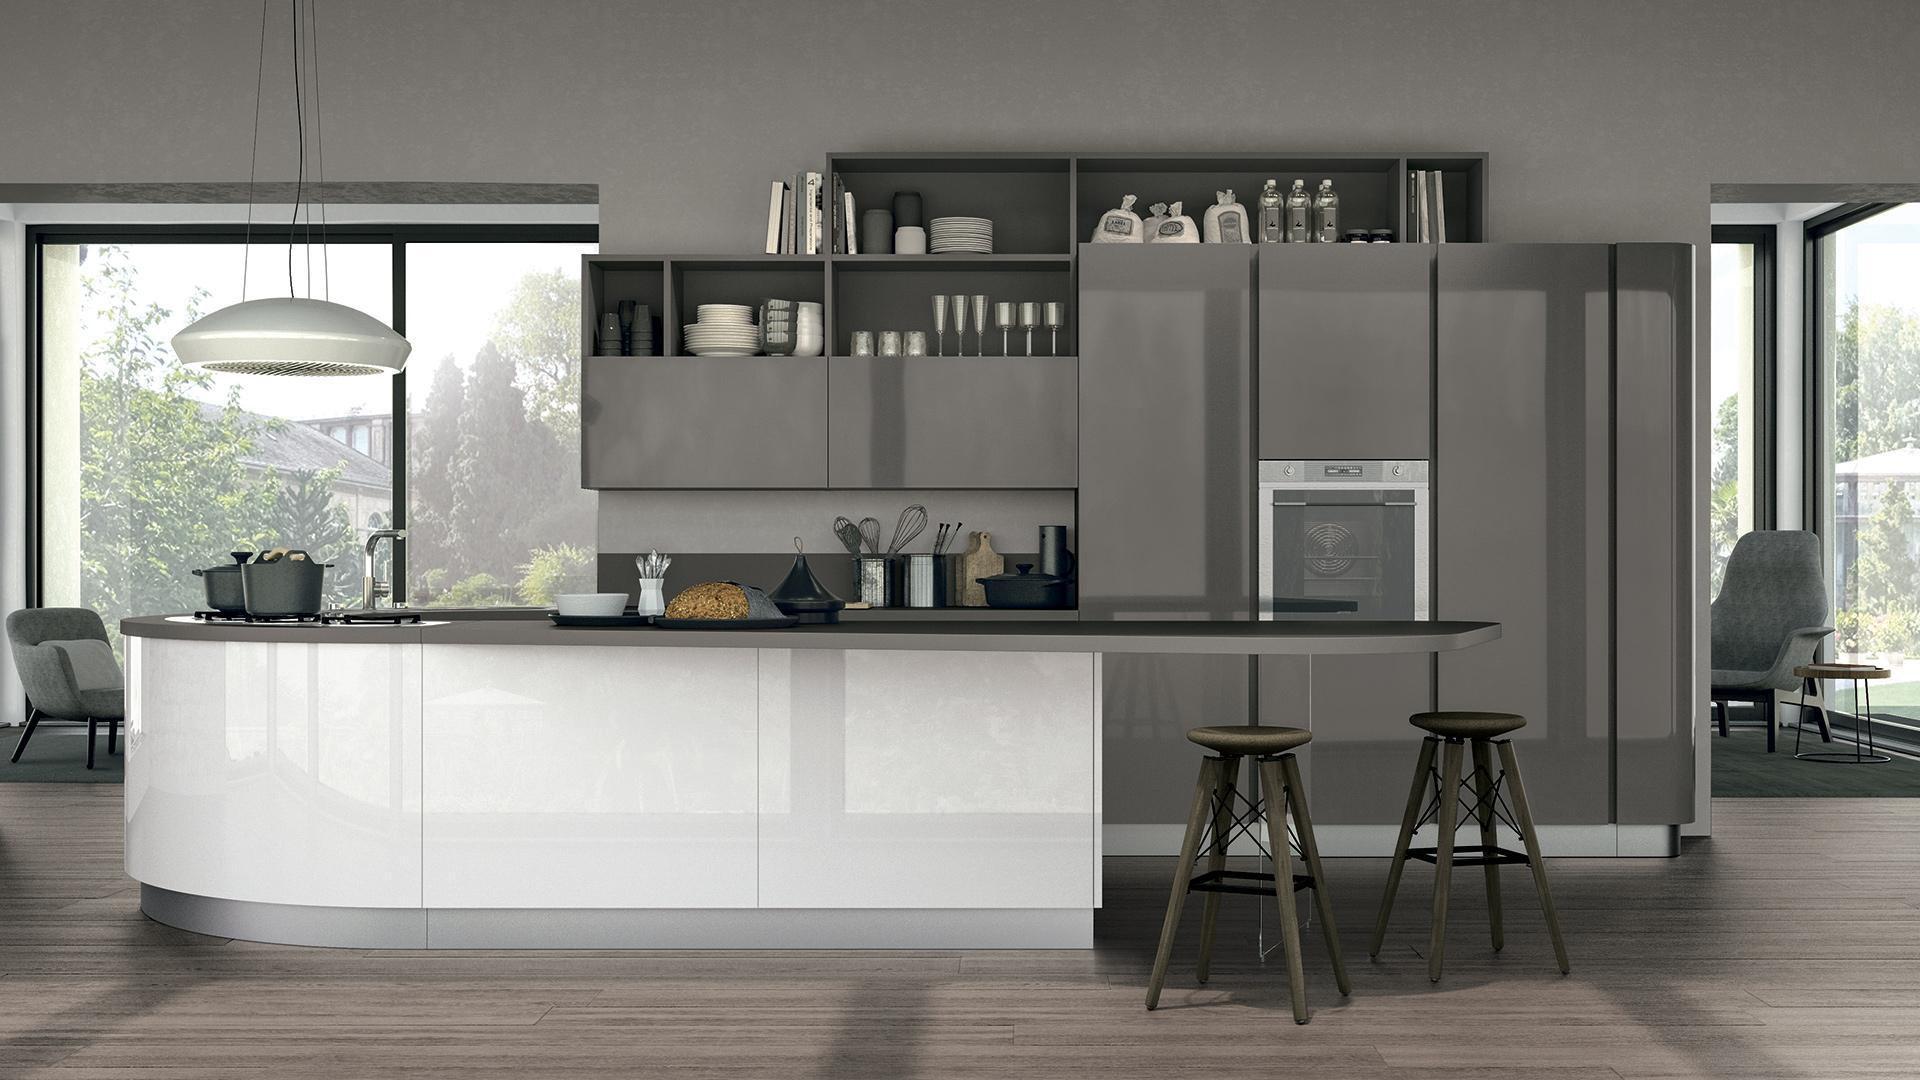 Arredare una cucina buia: tutti i consigli per renderla più luminosa ...